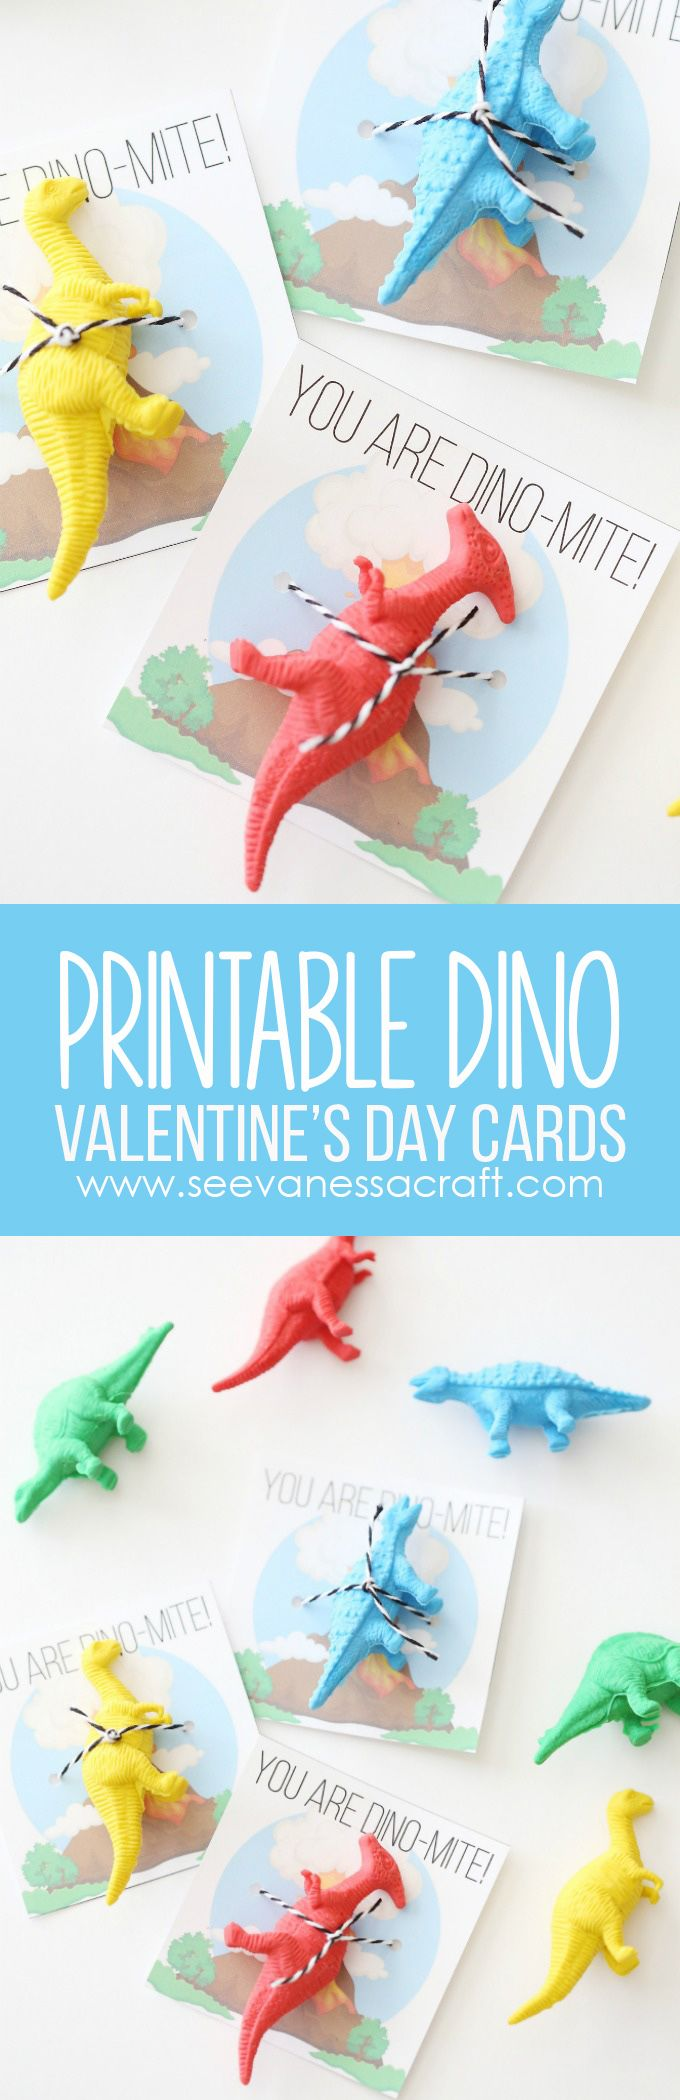 450 best Valentine\'s Day images on Pinterest | Valantine day ...